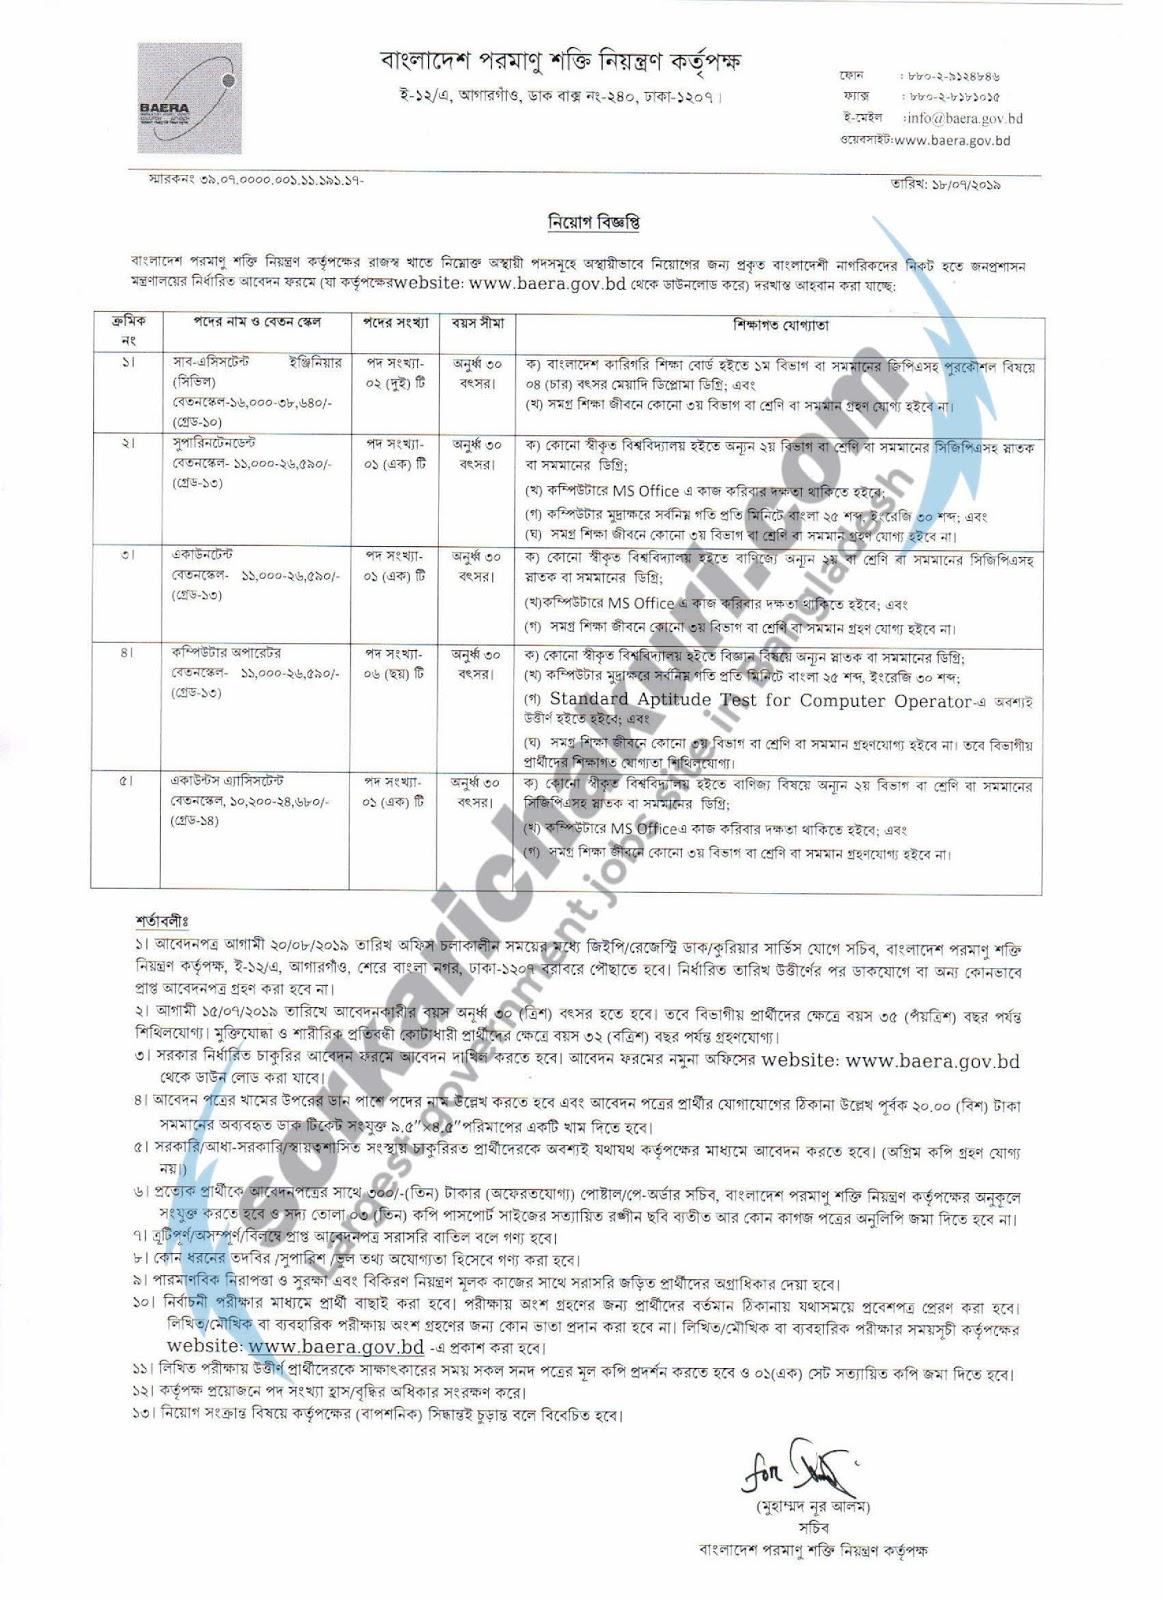 Bangladesh Atomic Energy Regulatory Authority Jobs Circular 2019